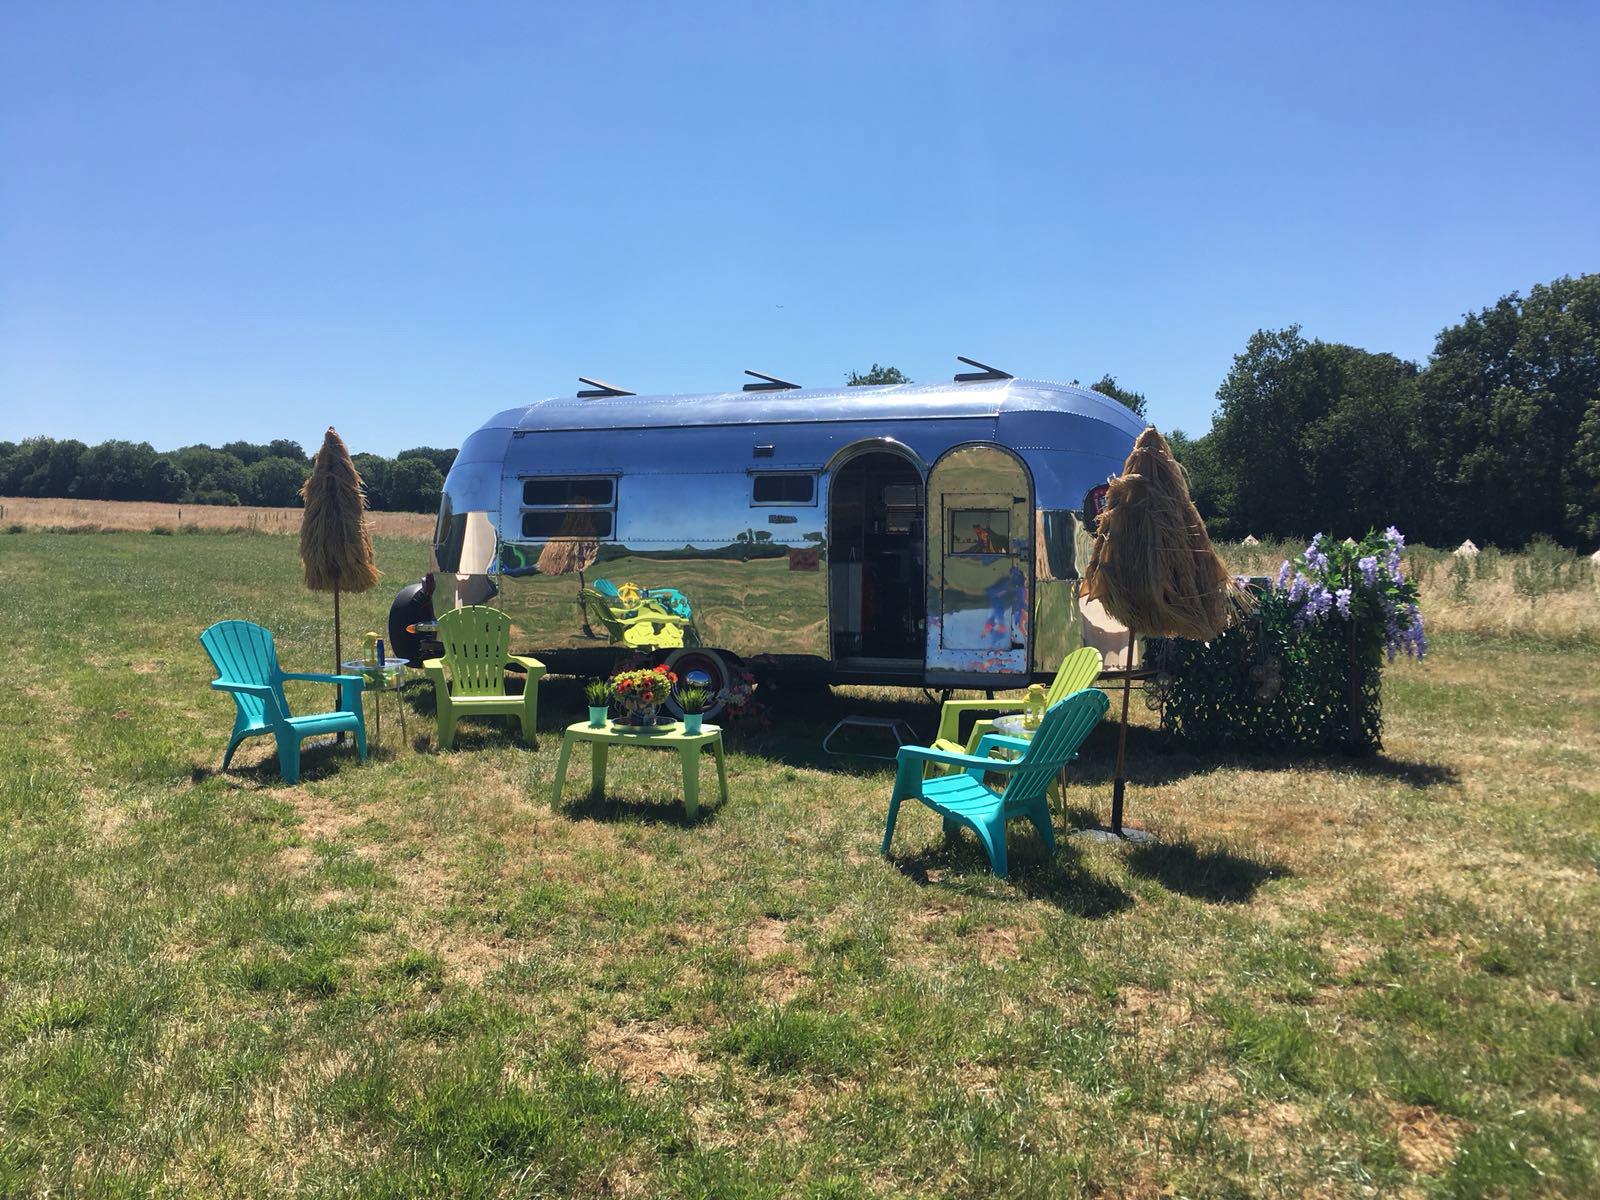 Fiesta-Fields-outdoor-work-summert-party-airstreamJPG.JPG